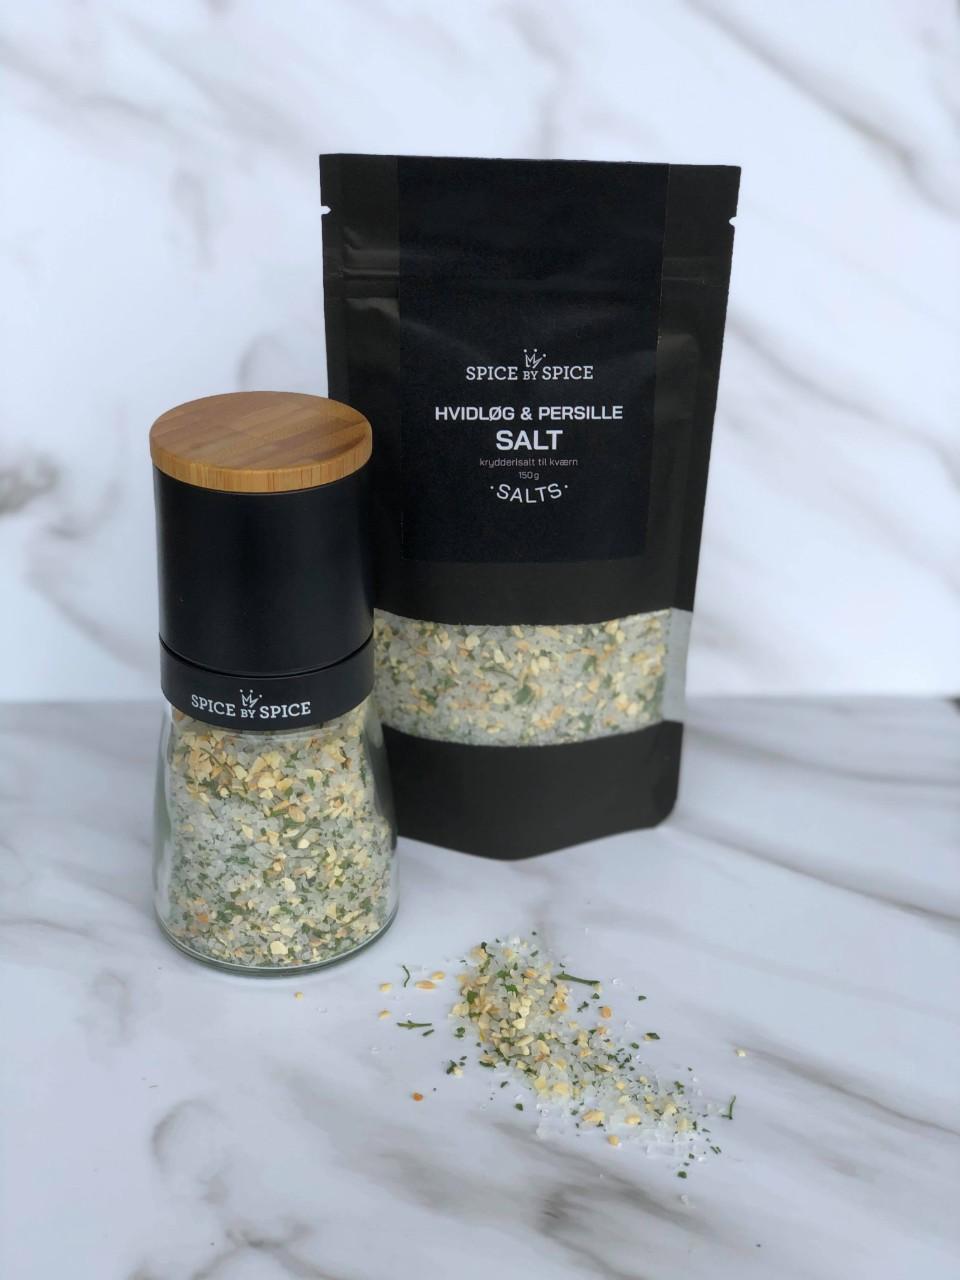 hvidlog og persille salt med refill pose